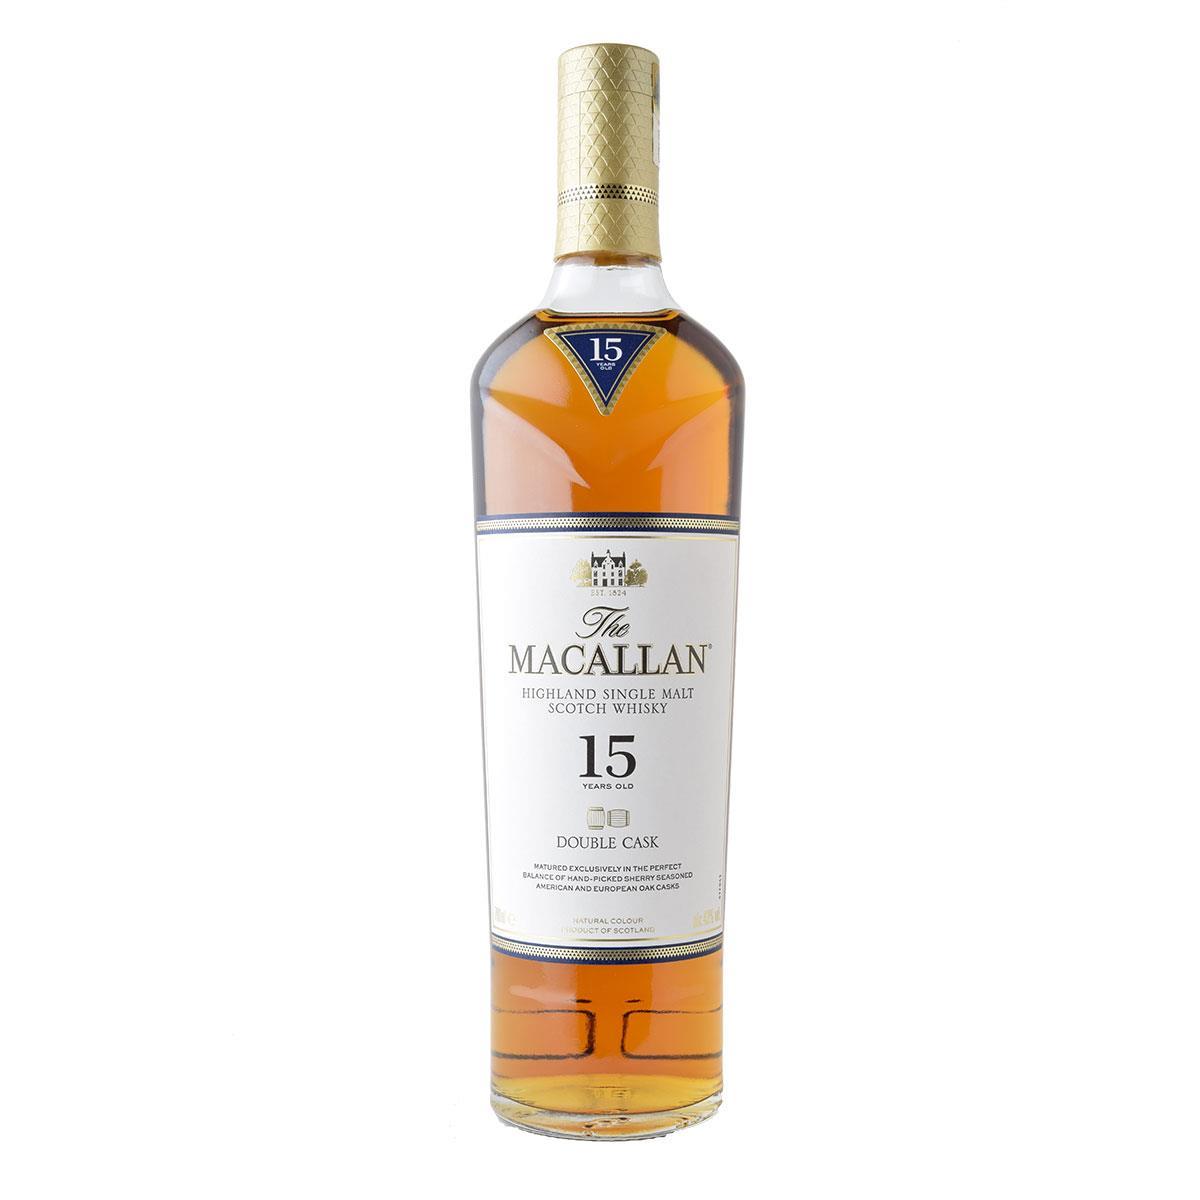 Macallan 15 y.o. Double Cask 700ml